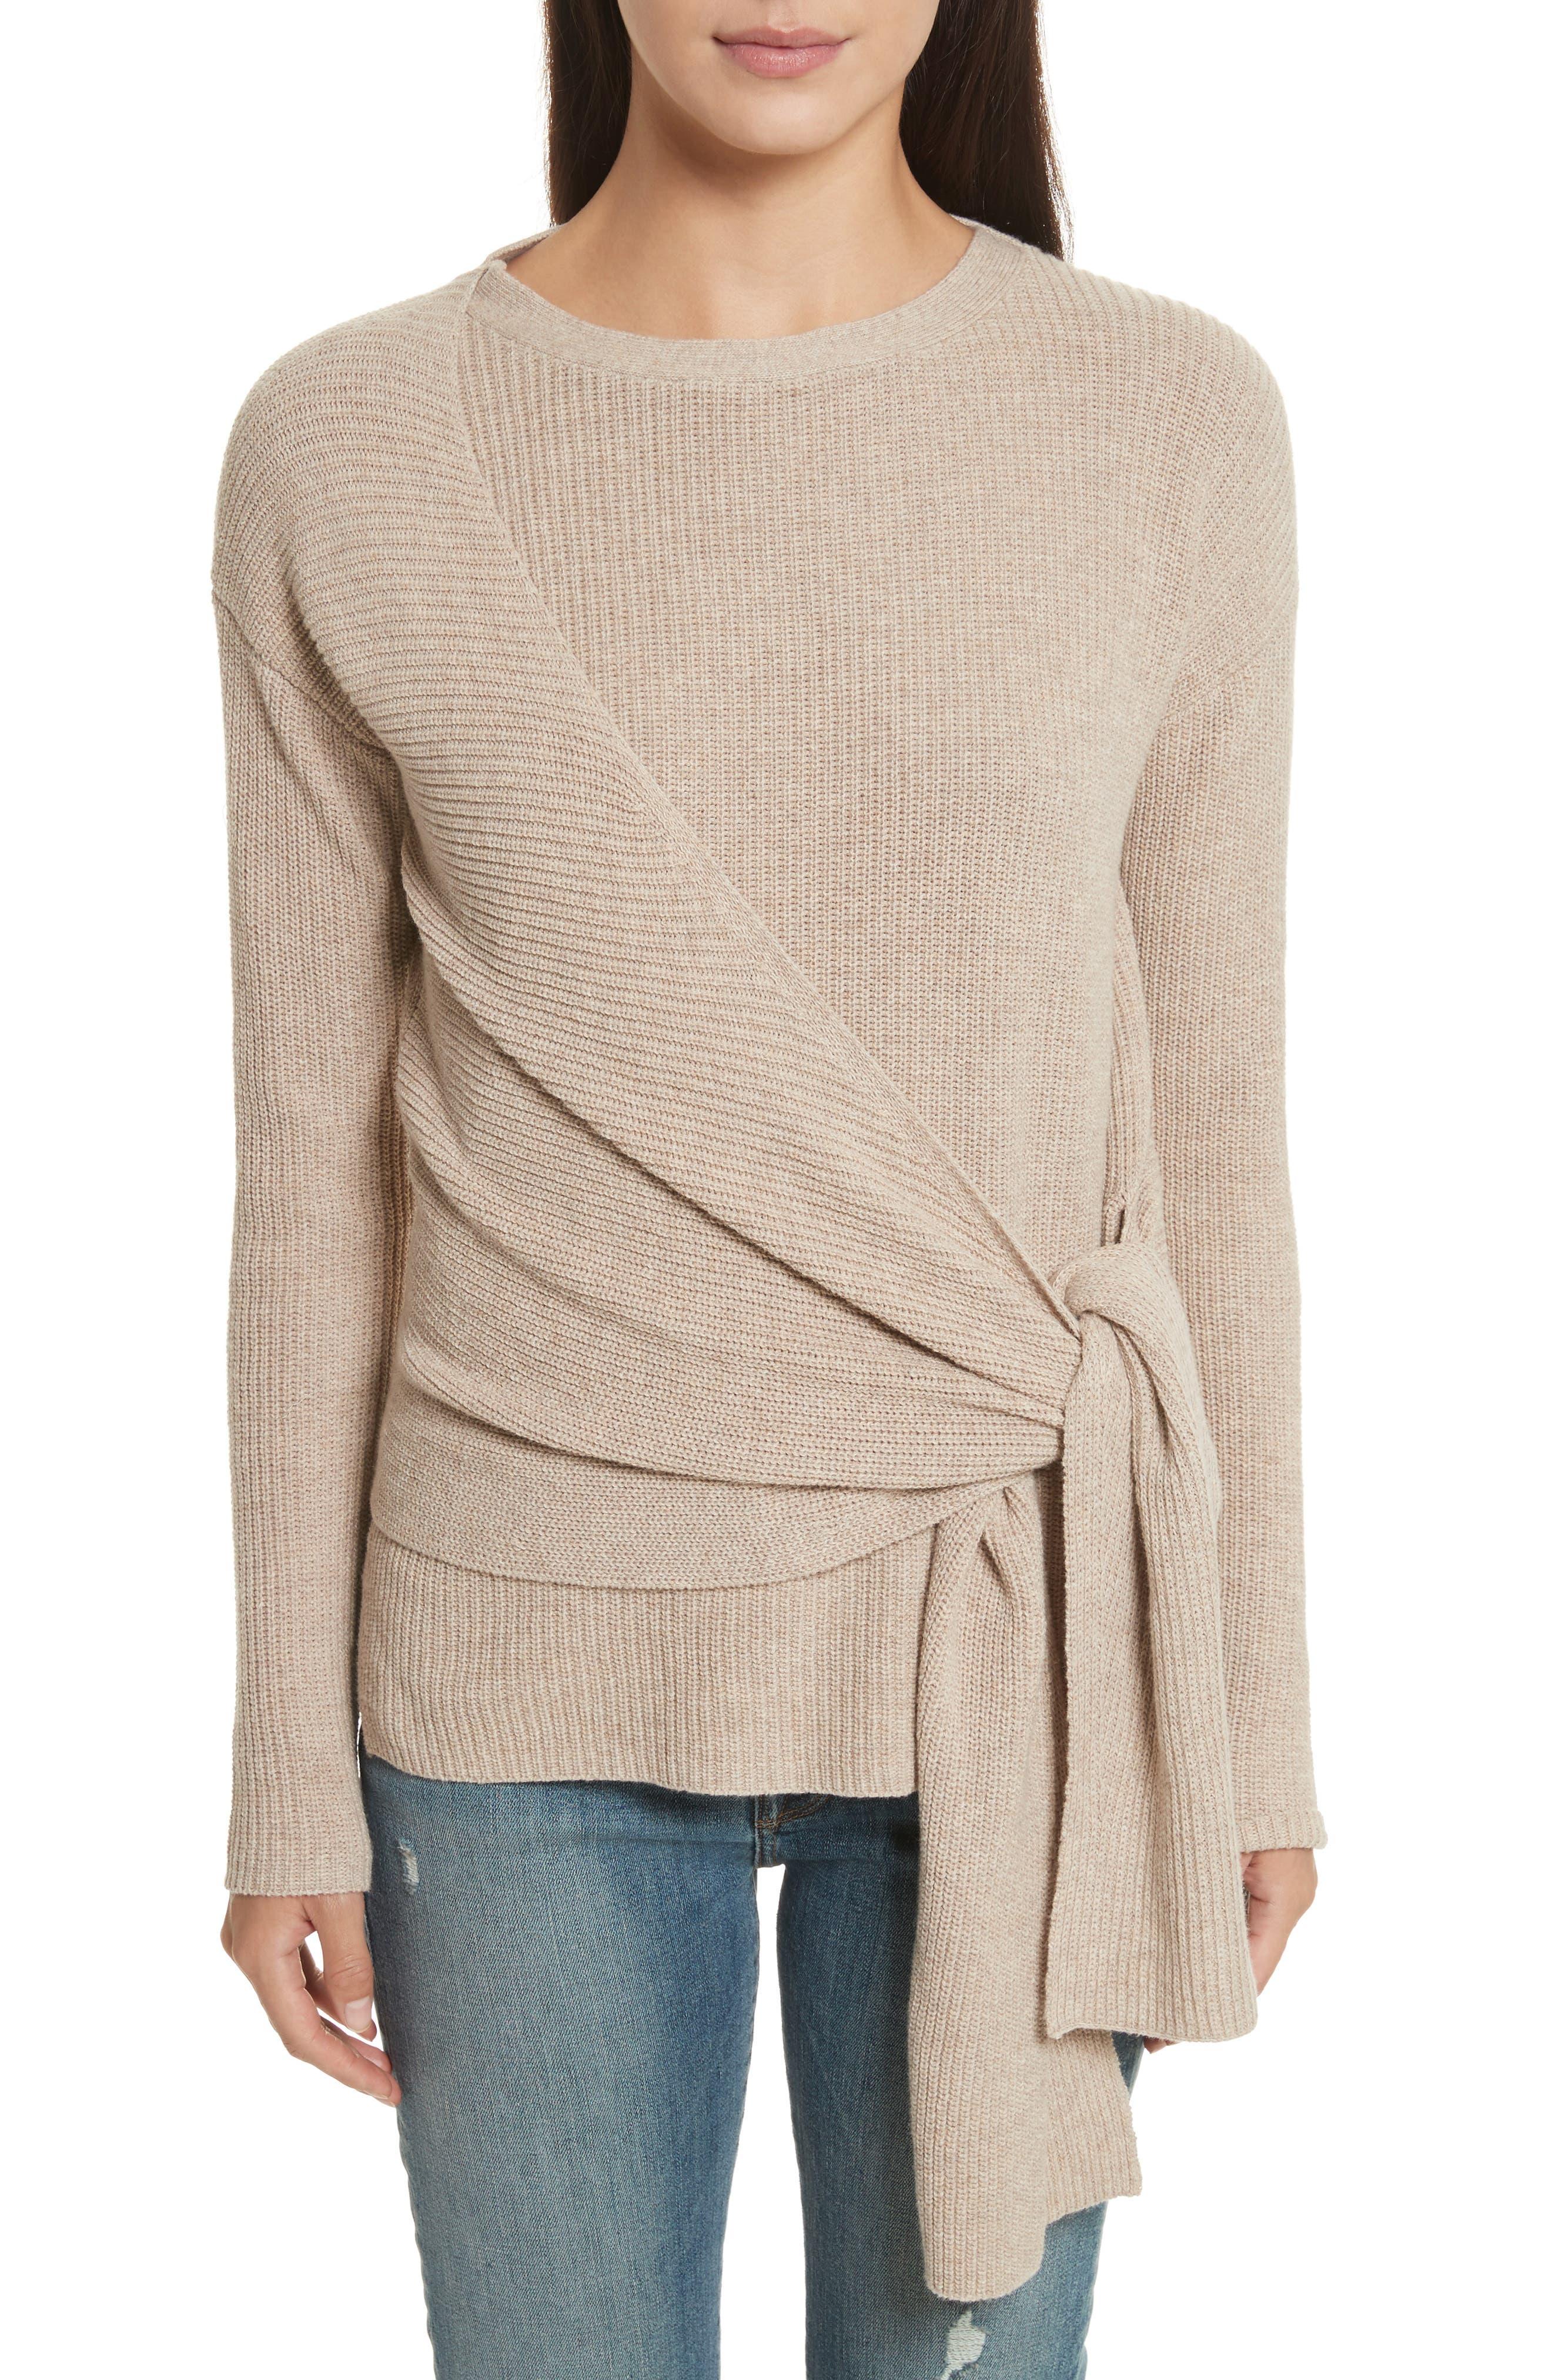 Greys Wrap Sweater,                         Main,                         color, 270